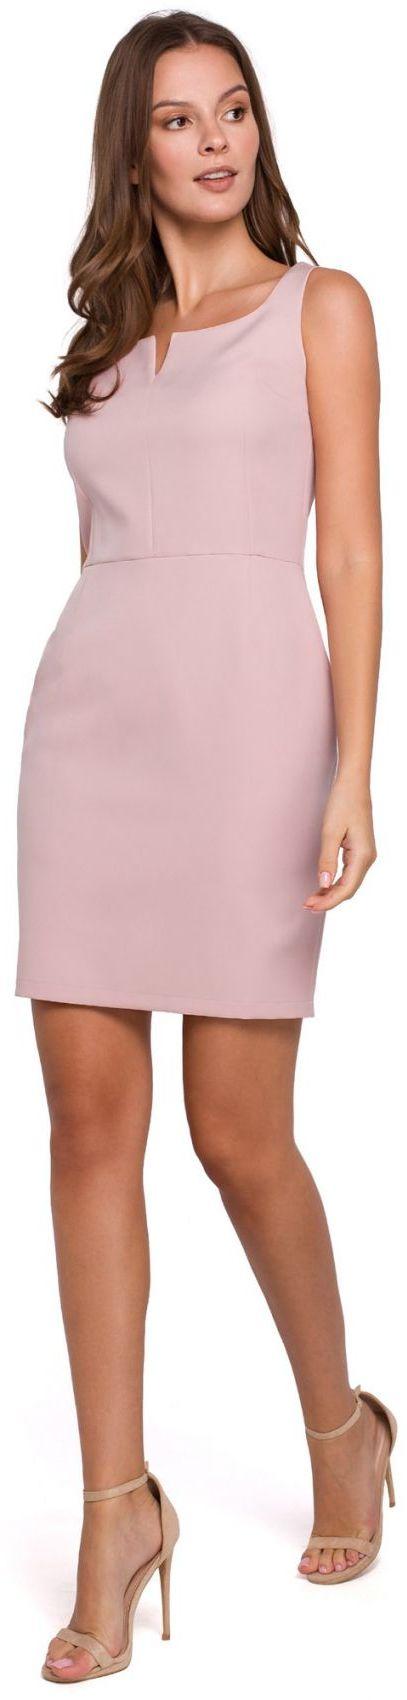 K022 Sukienka mini z dekoltem karo - brudny róż